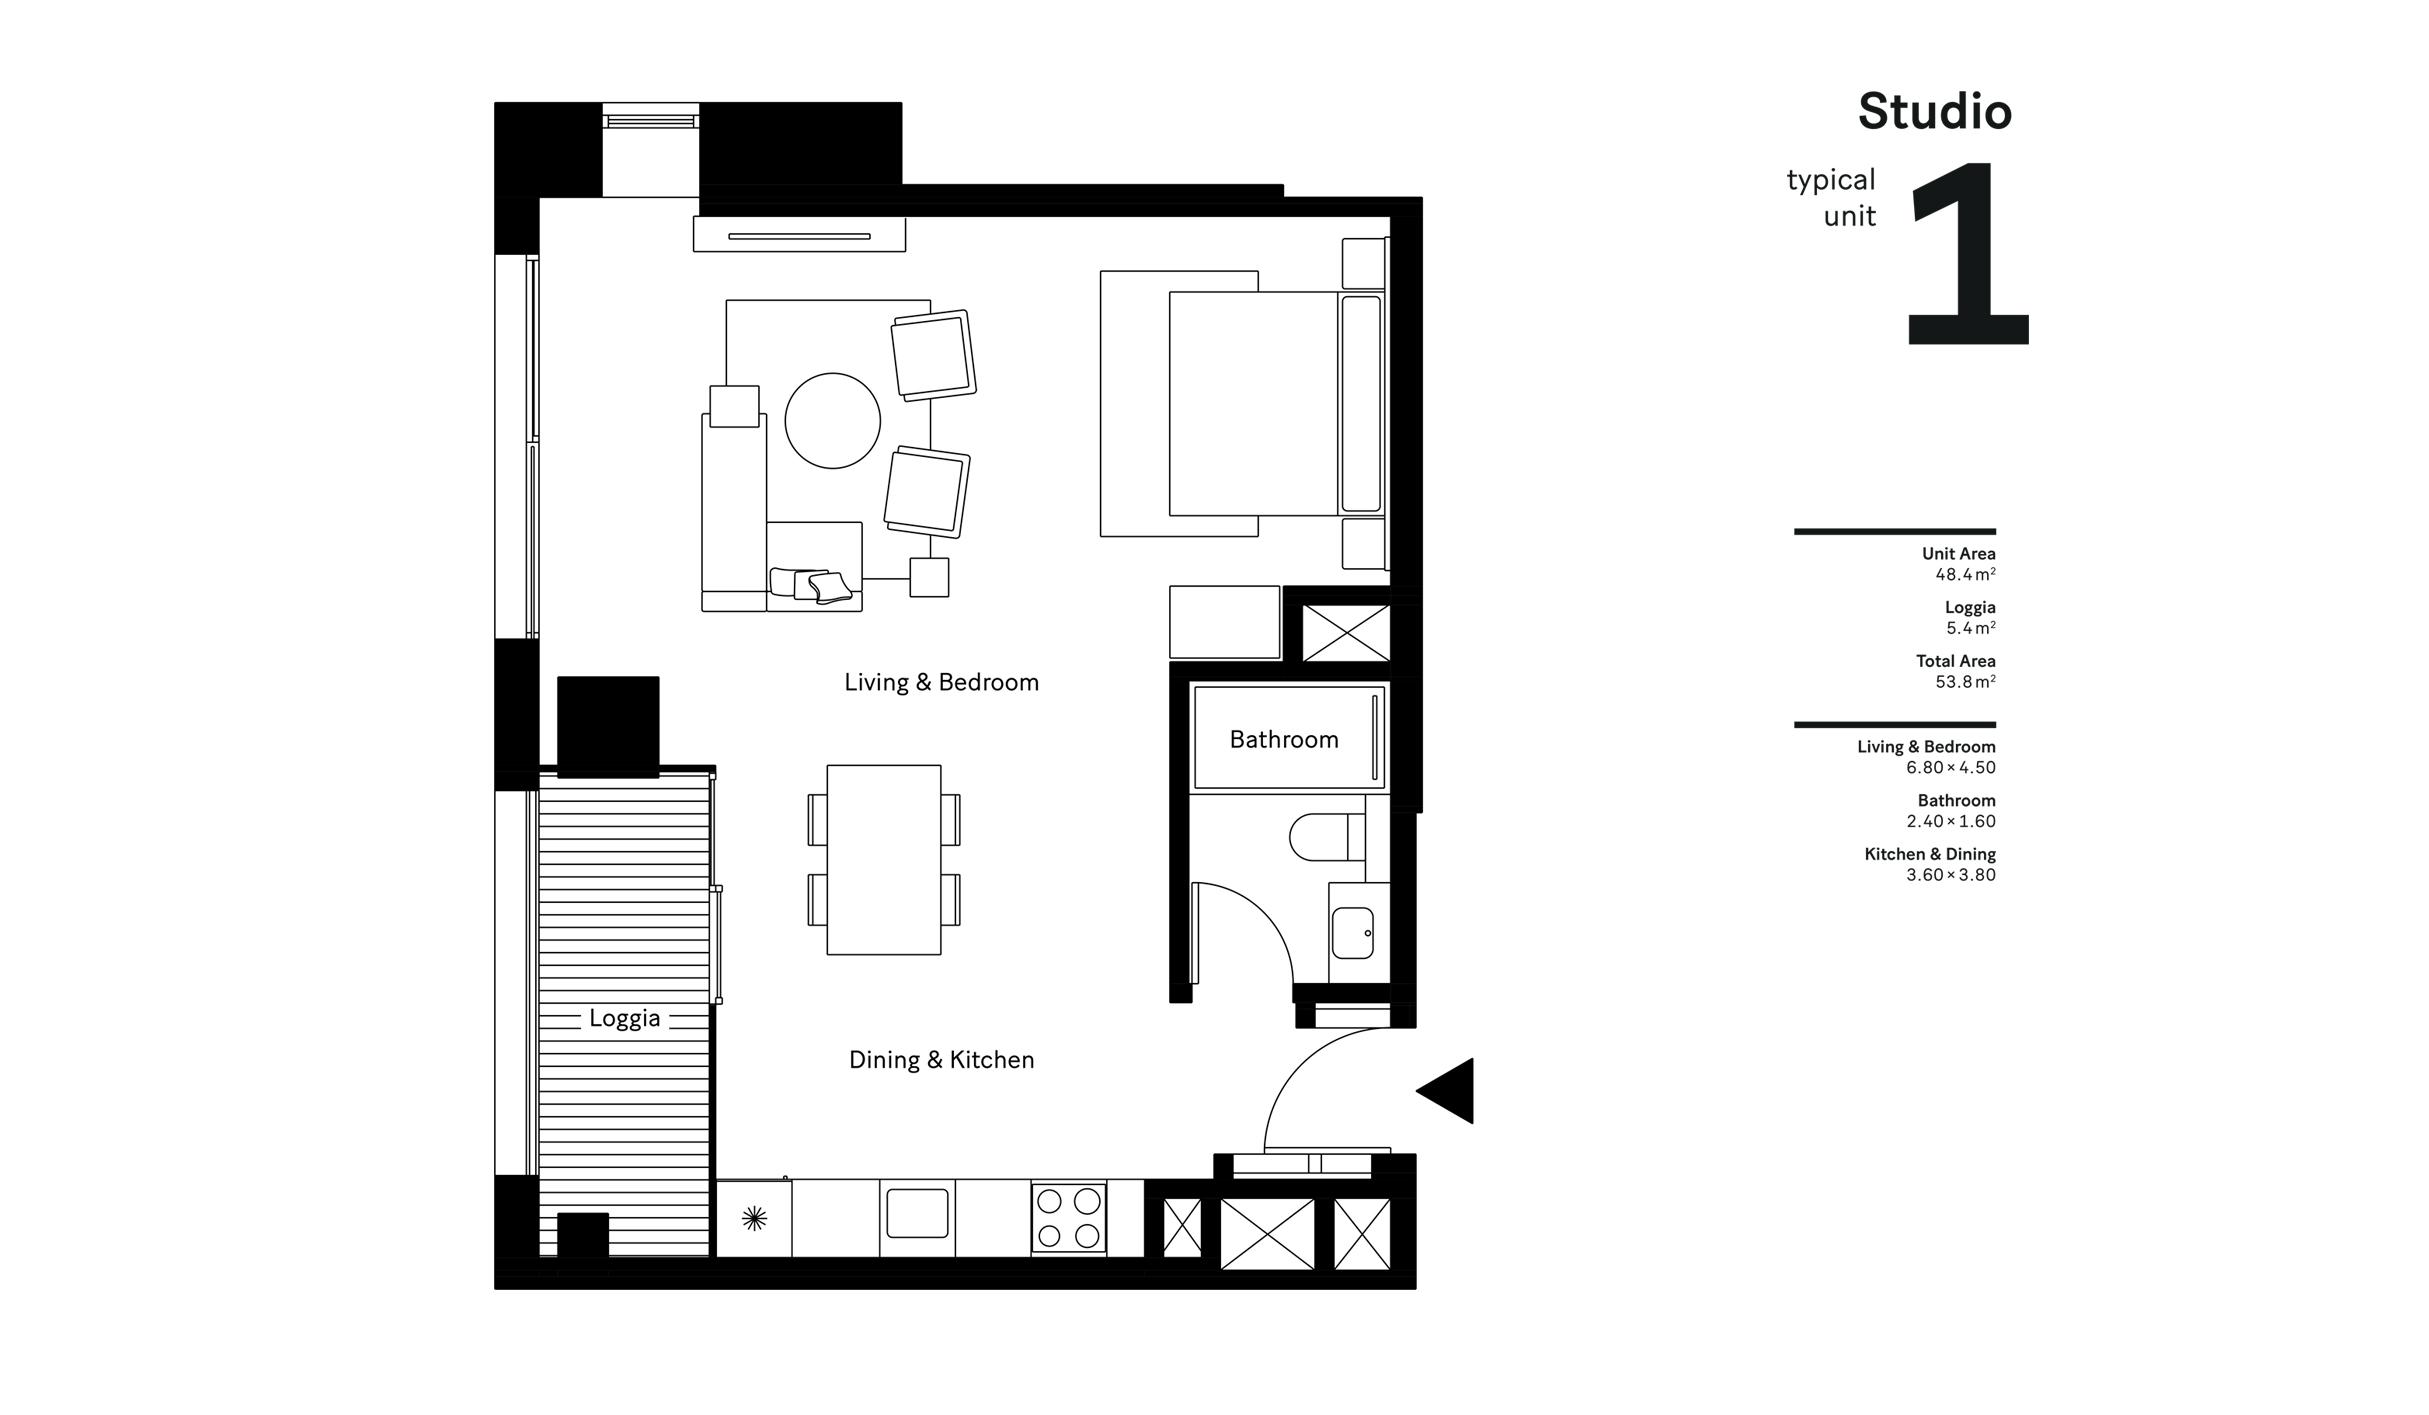 Studio  Size - 53.8 sqm